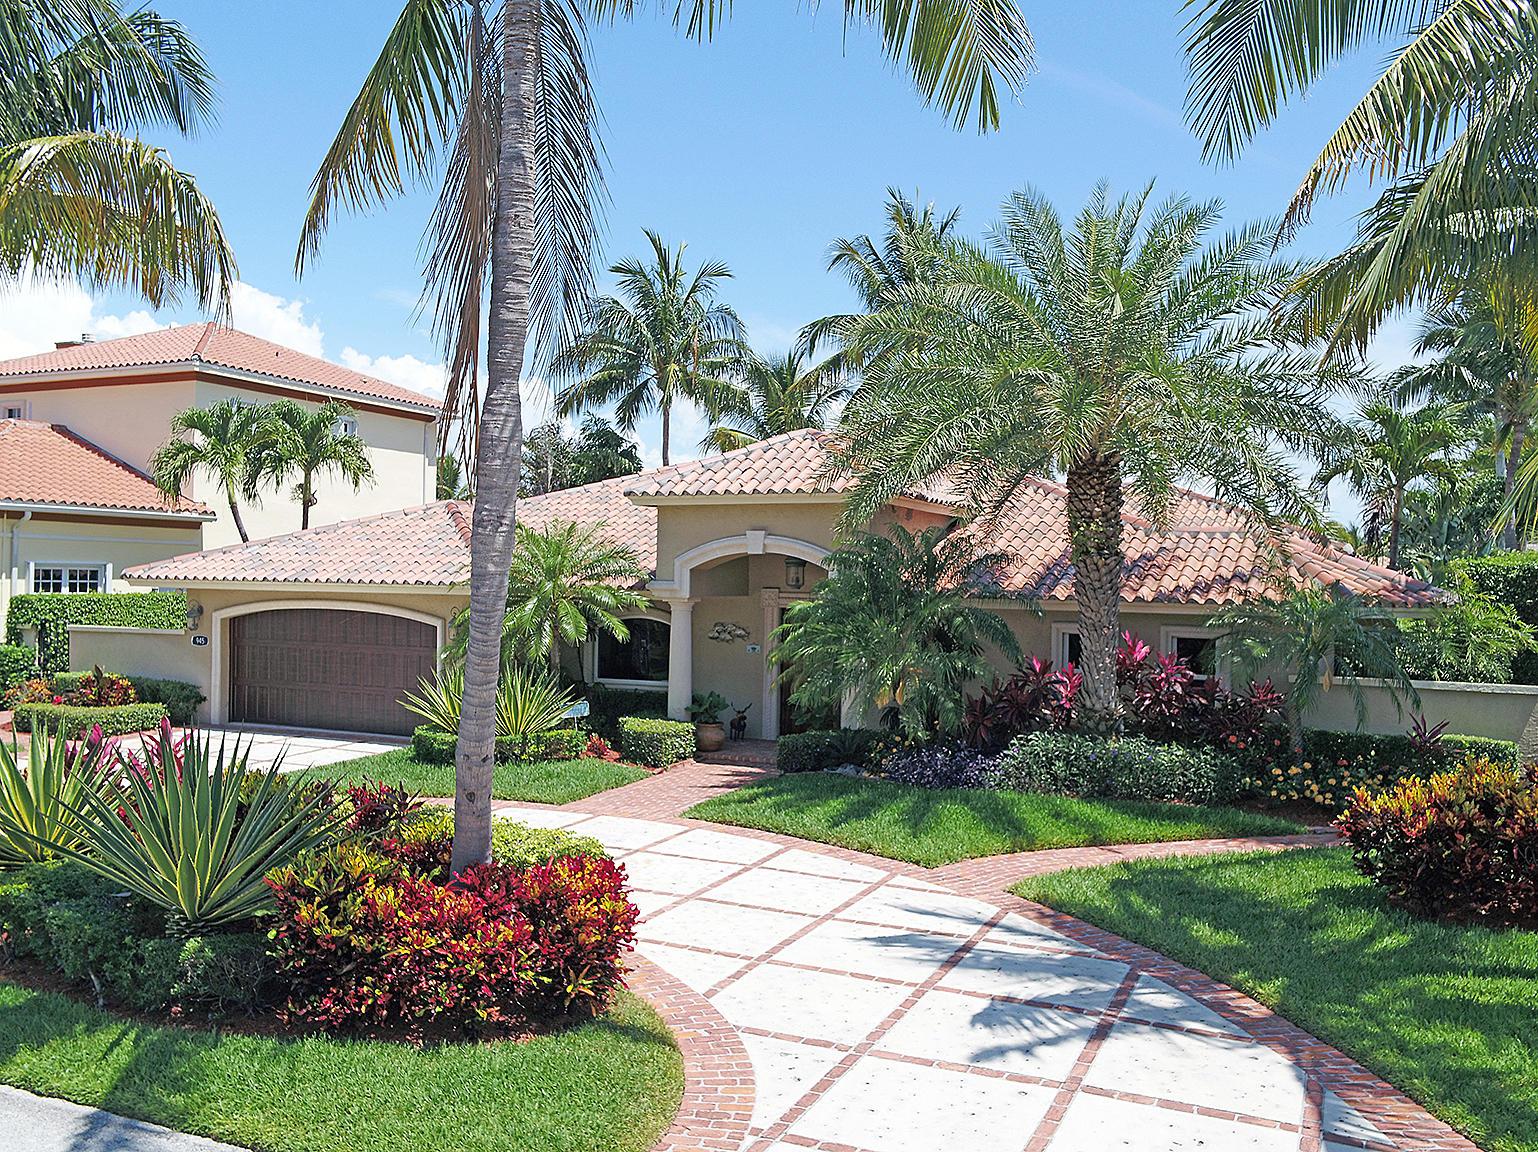 945 Tropic Boulevard, Delray Beach, Florida 33483, 4 Bedrooms Bedrooms, ,3 BathroomsBathrooms,Single Family Detached,For Sale,Tropic,RX-10537319